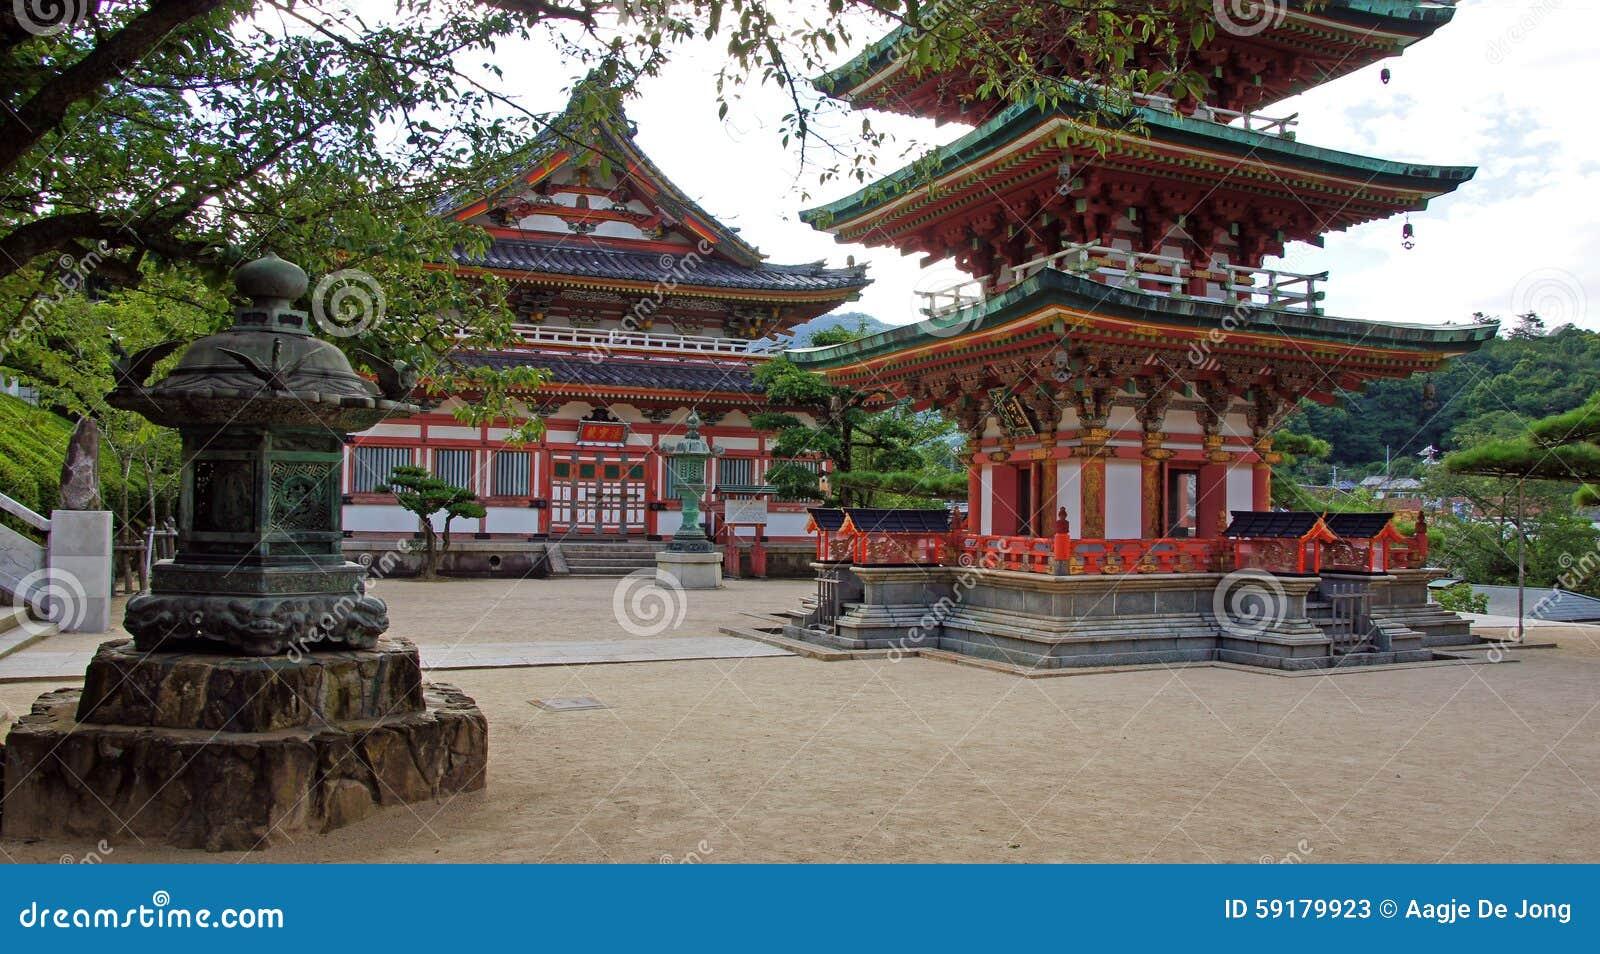 Sohozopaviljoen van Kosanji Temple in Japan